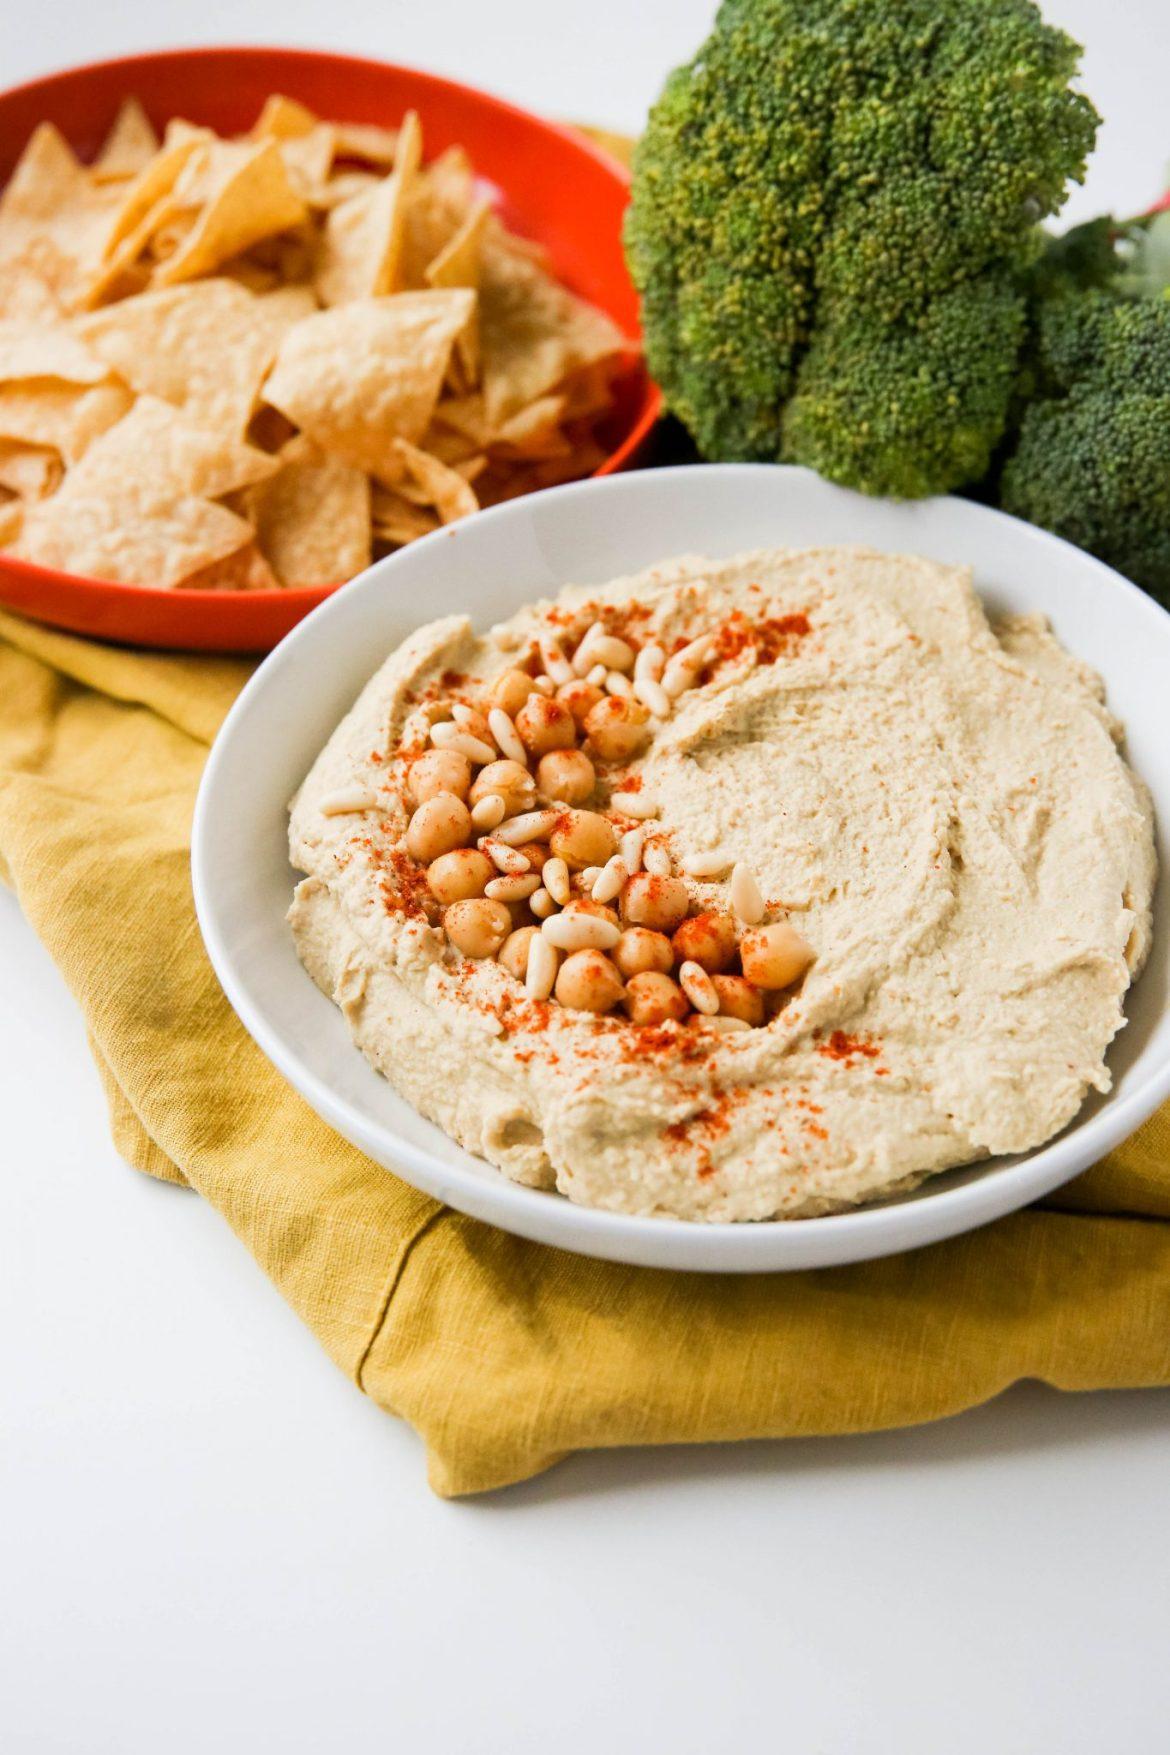 Easy homemade hummus - Dr. Pingel